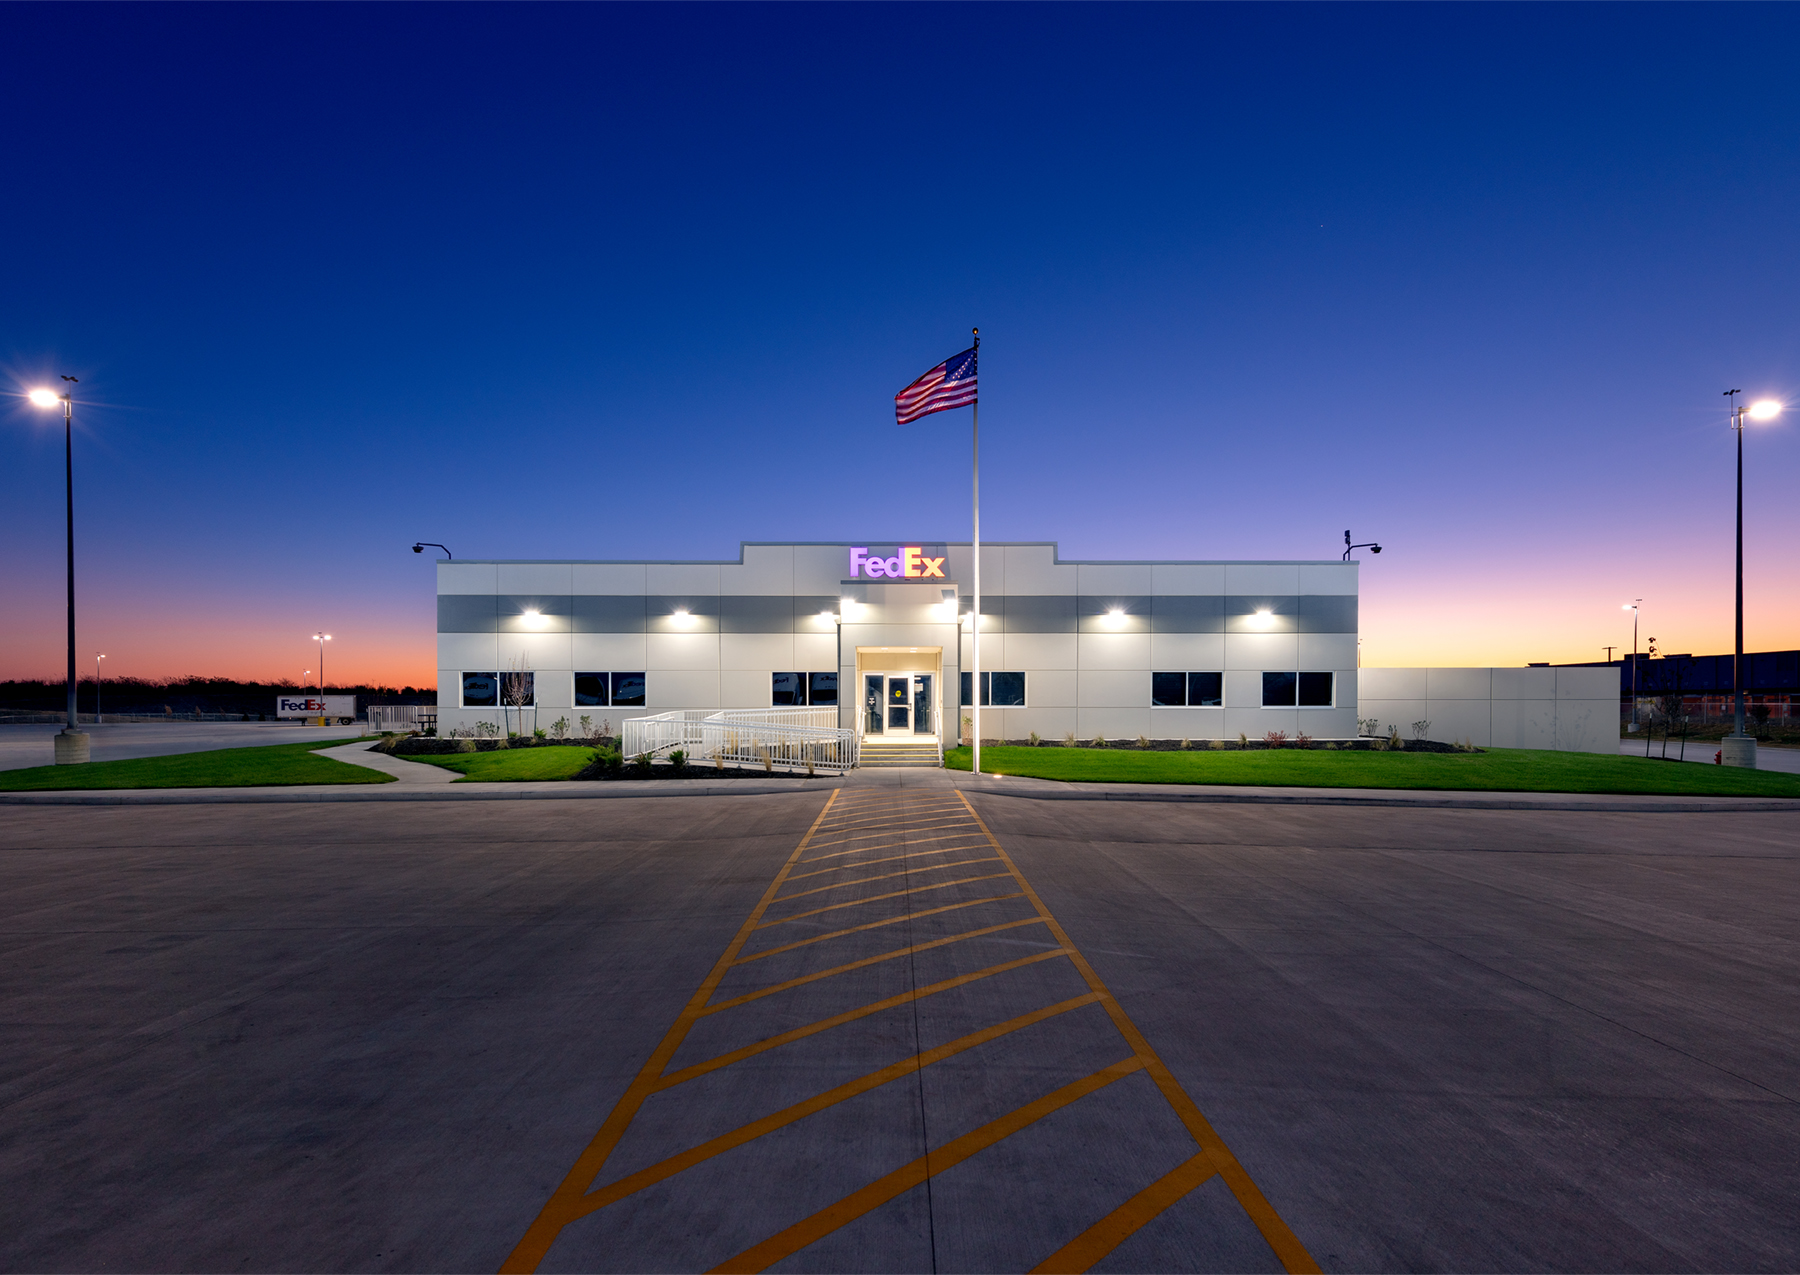 FedEx Freight - Topeka, KS